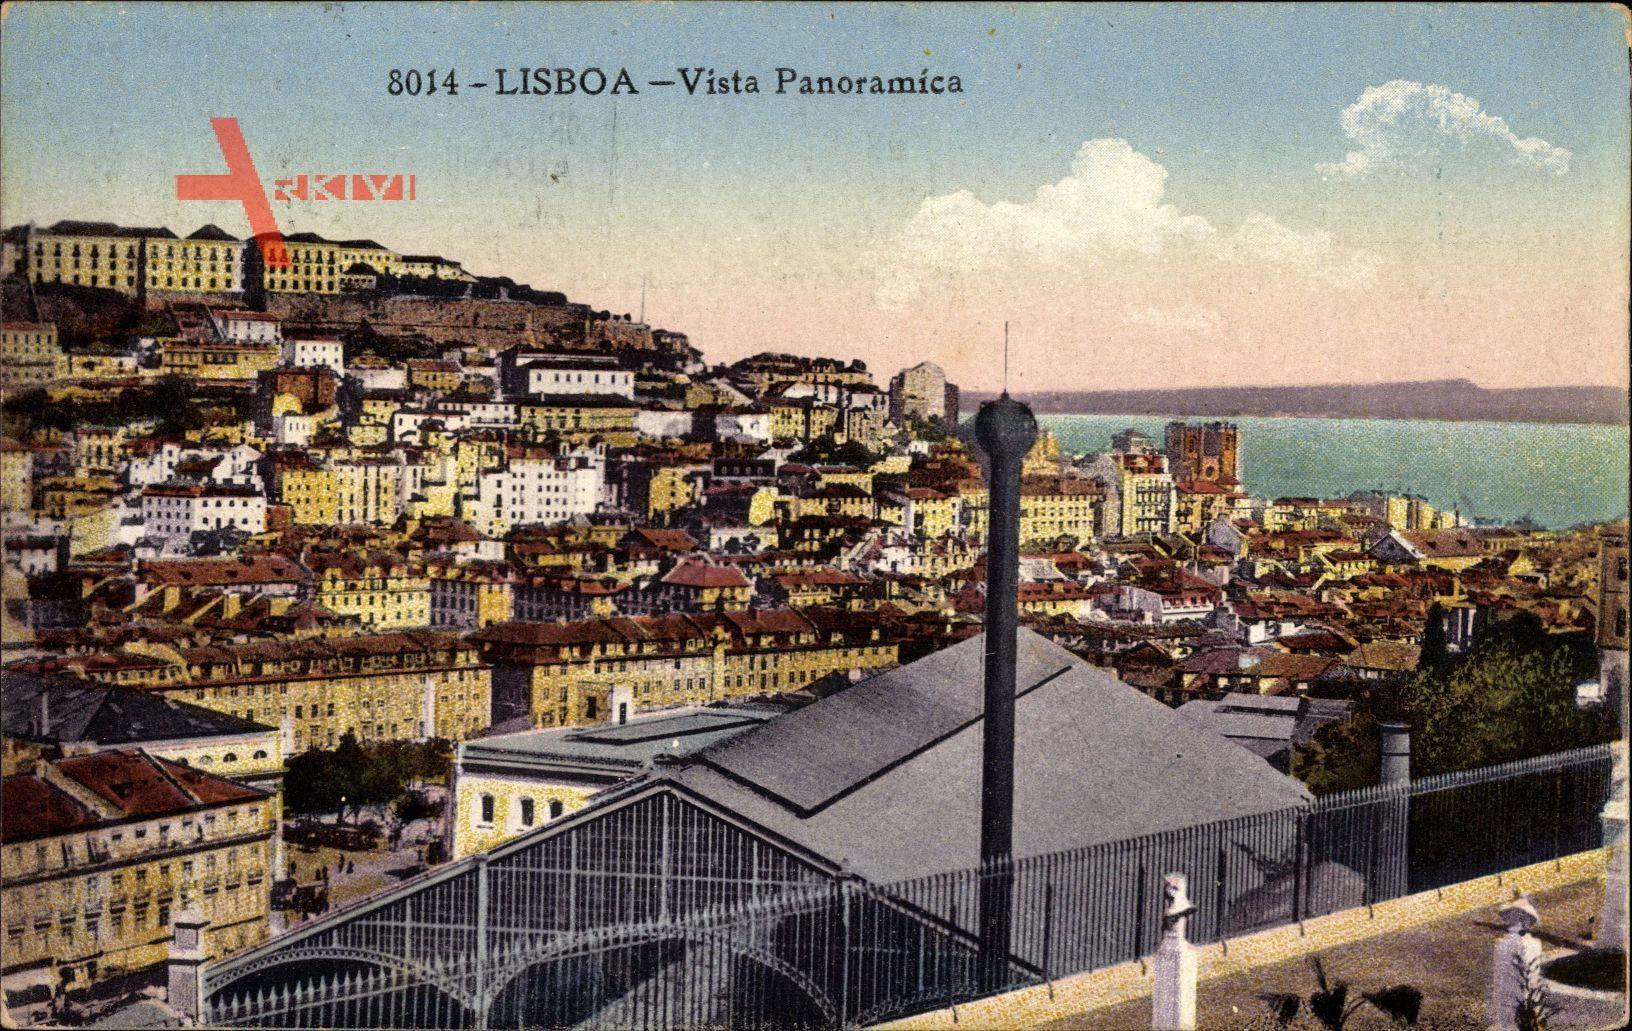 Lisboa Lissabon Portugal, Vista Panoramica, Panorama der Stadt